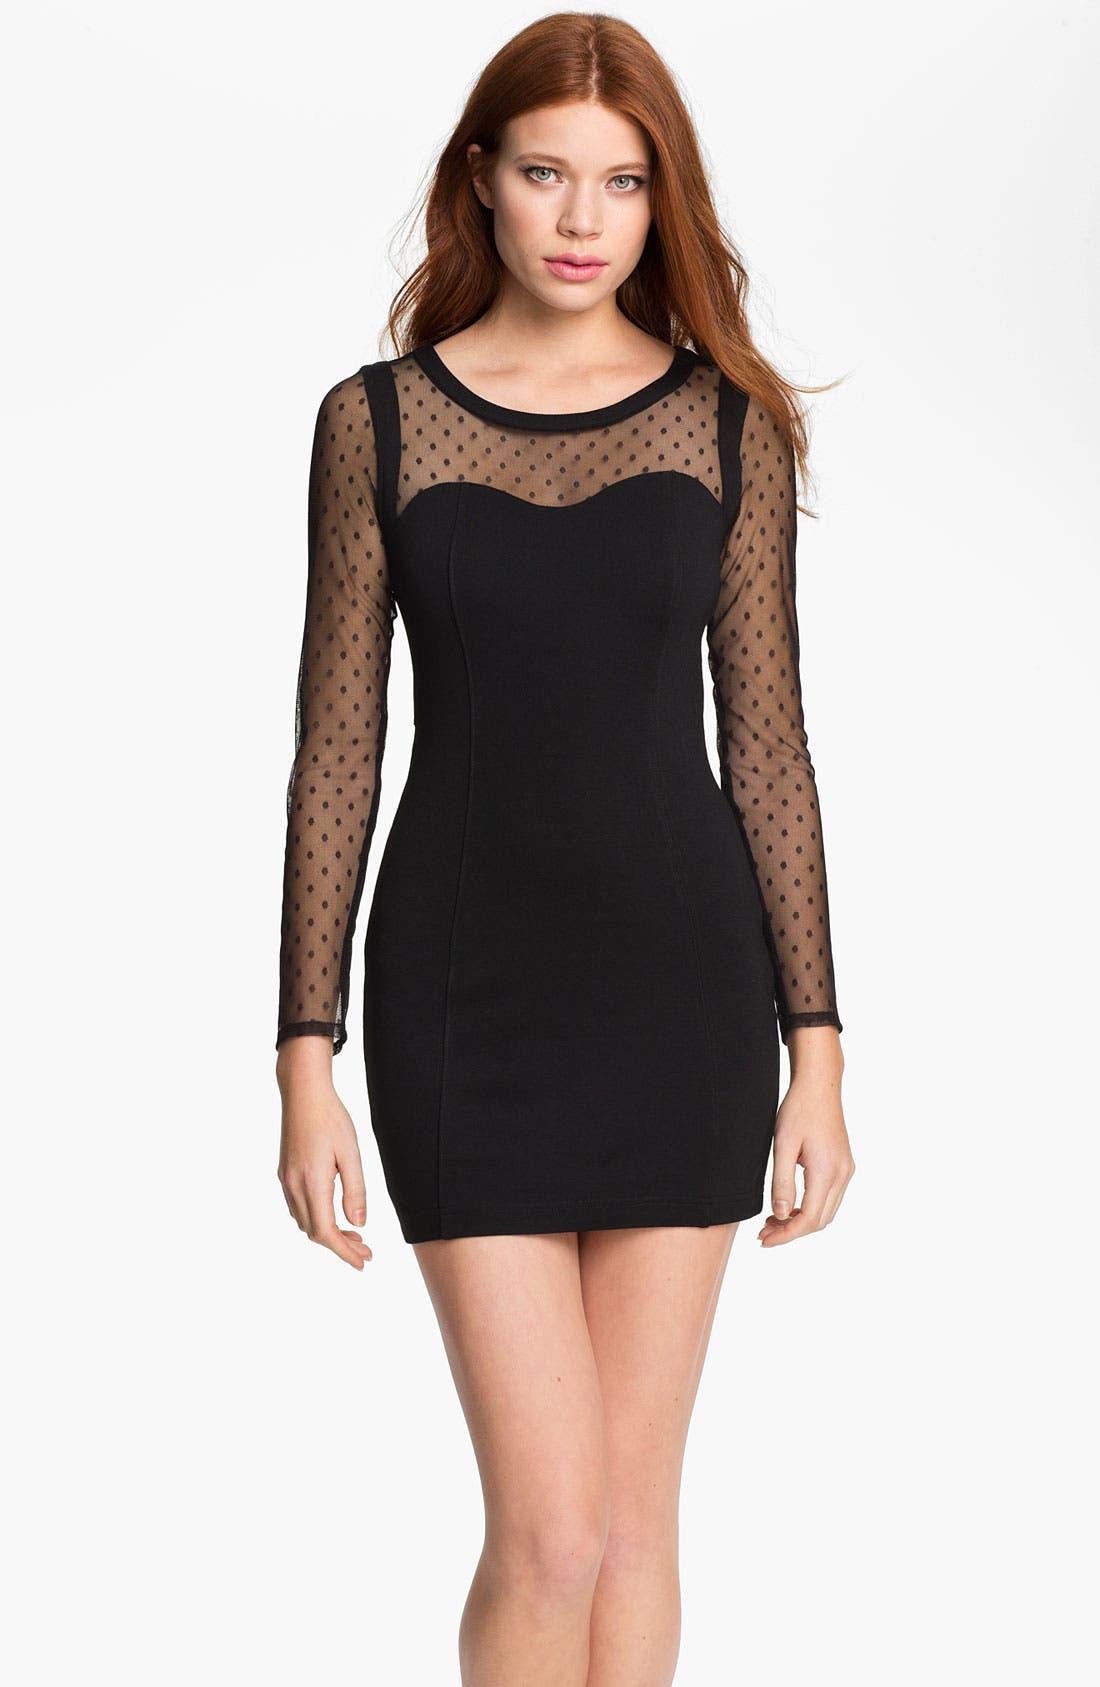 Main Image - Keepsake the Label 'Devotion' Contoured Mini Dress